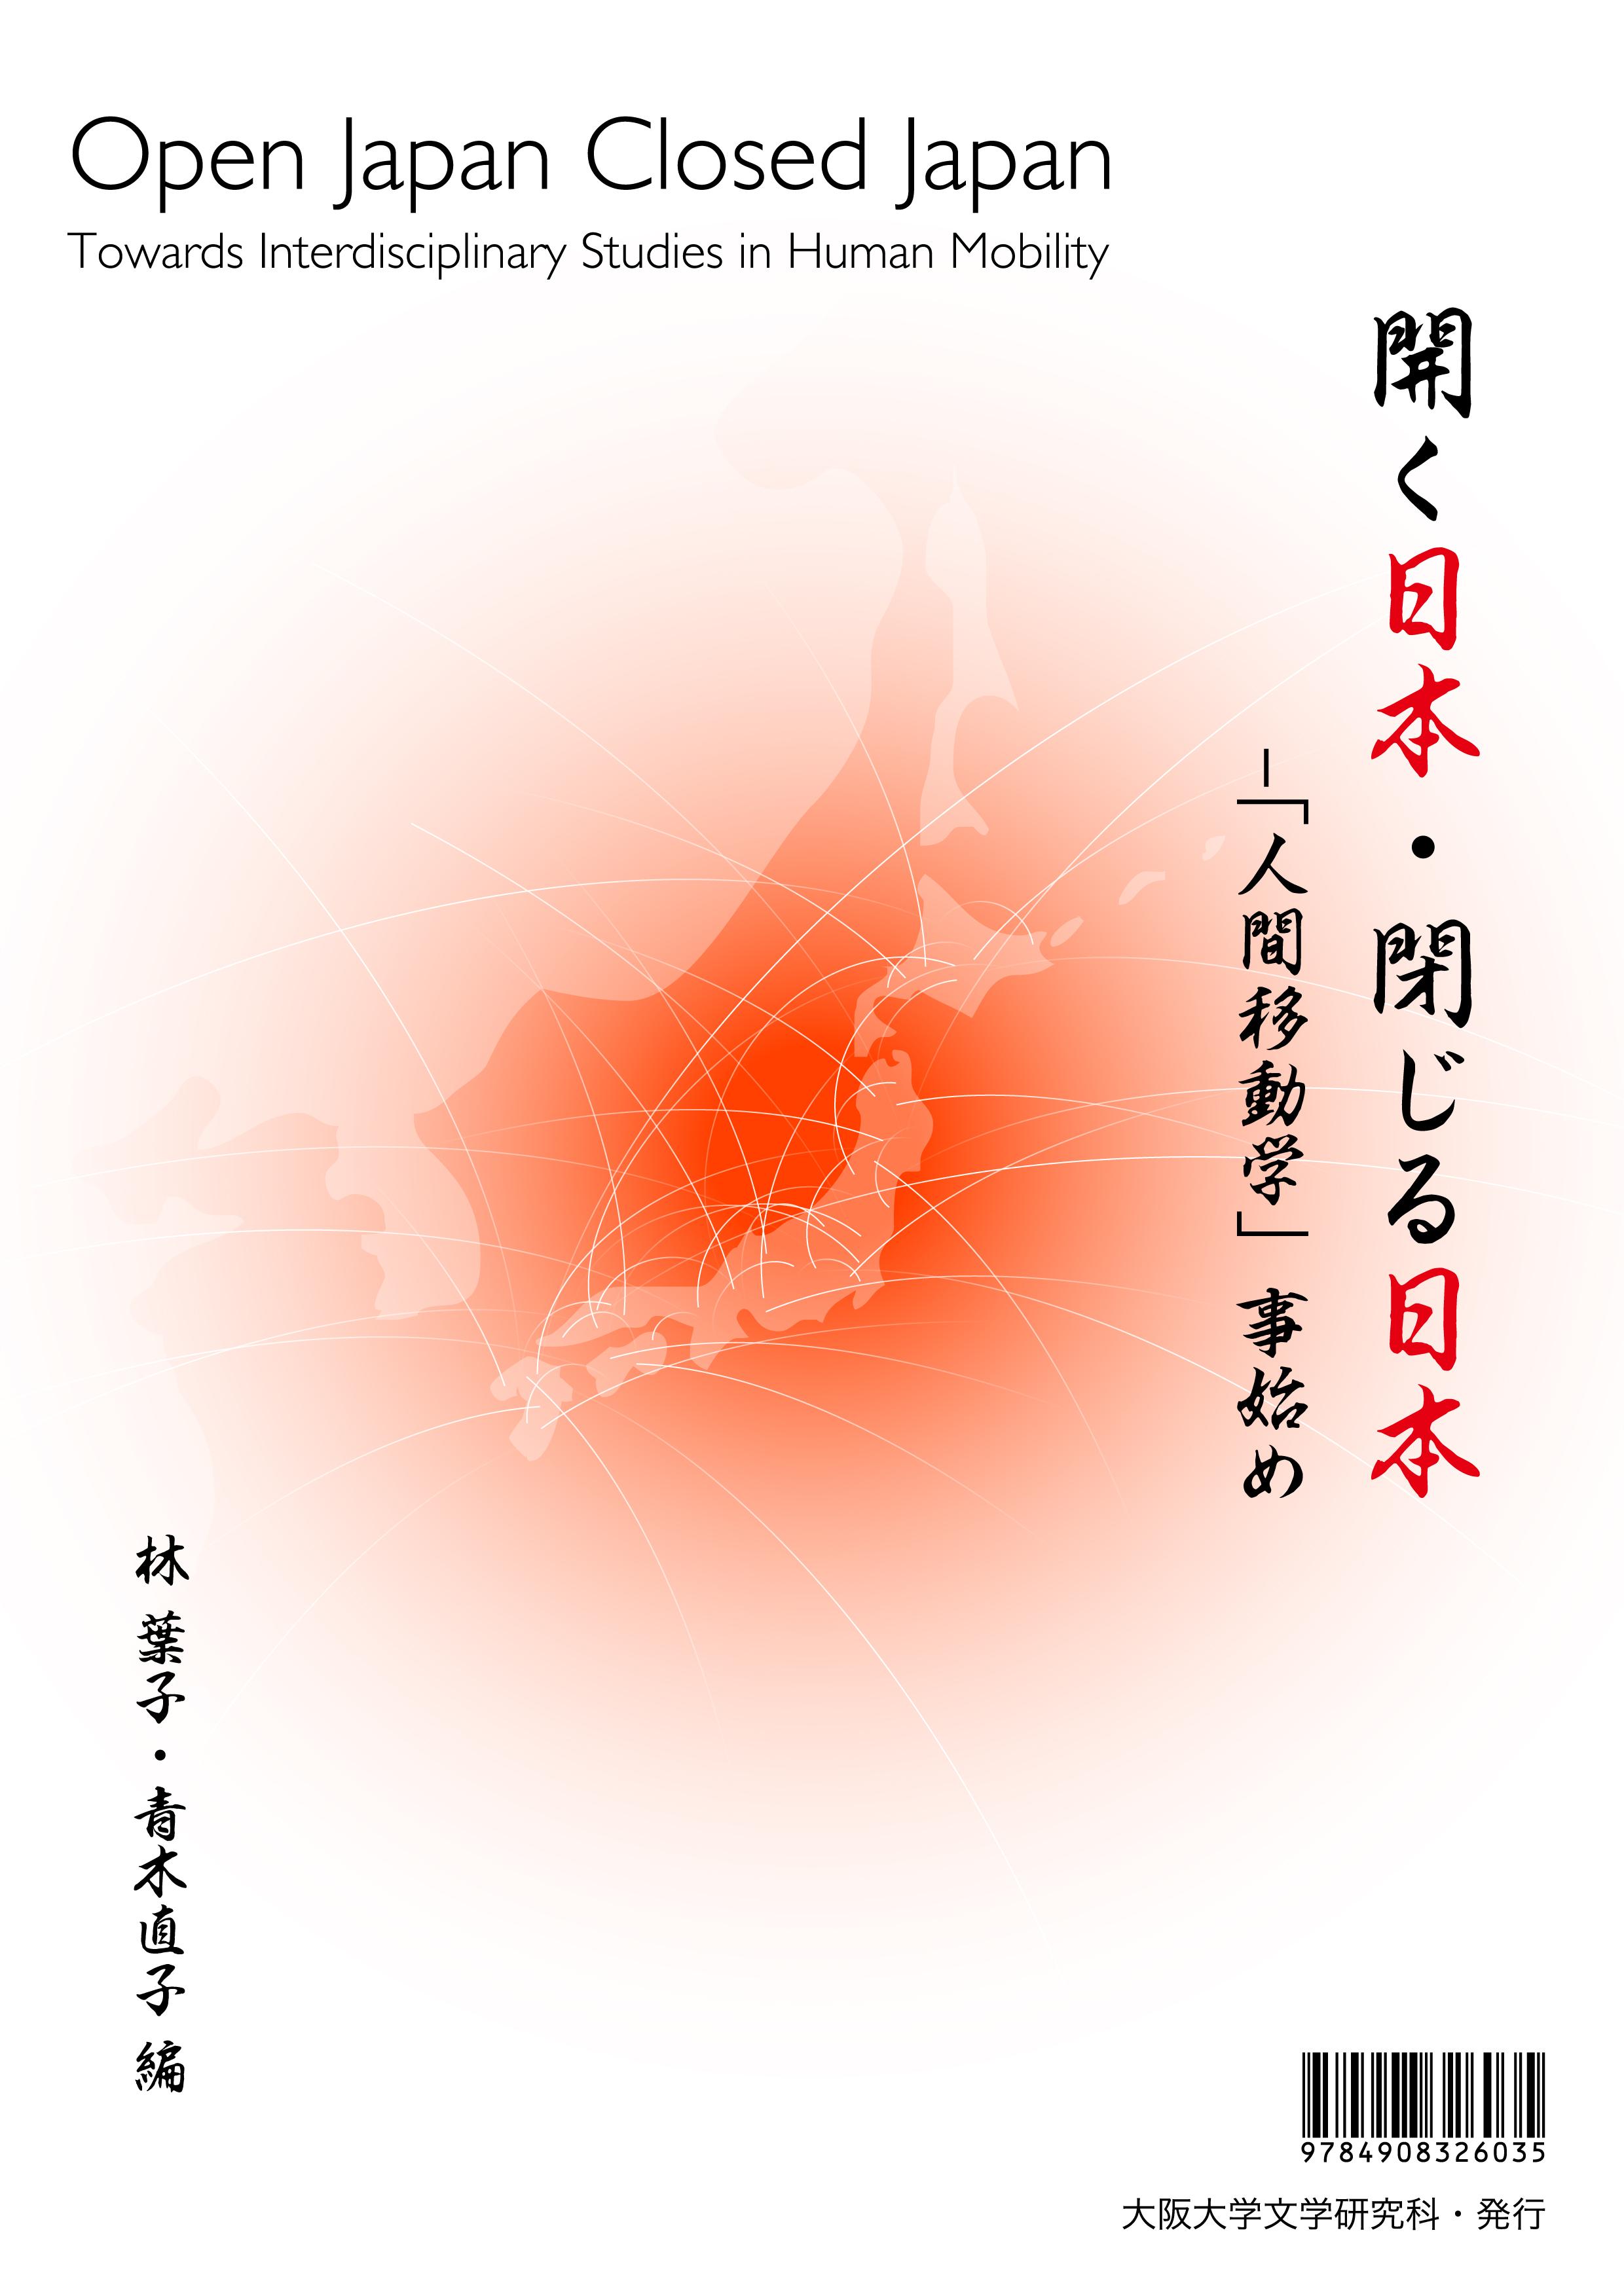 OpenJapanClosedJapan-1.jpg